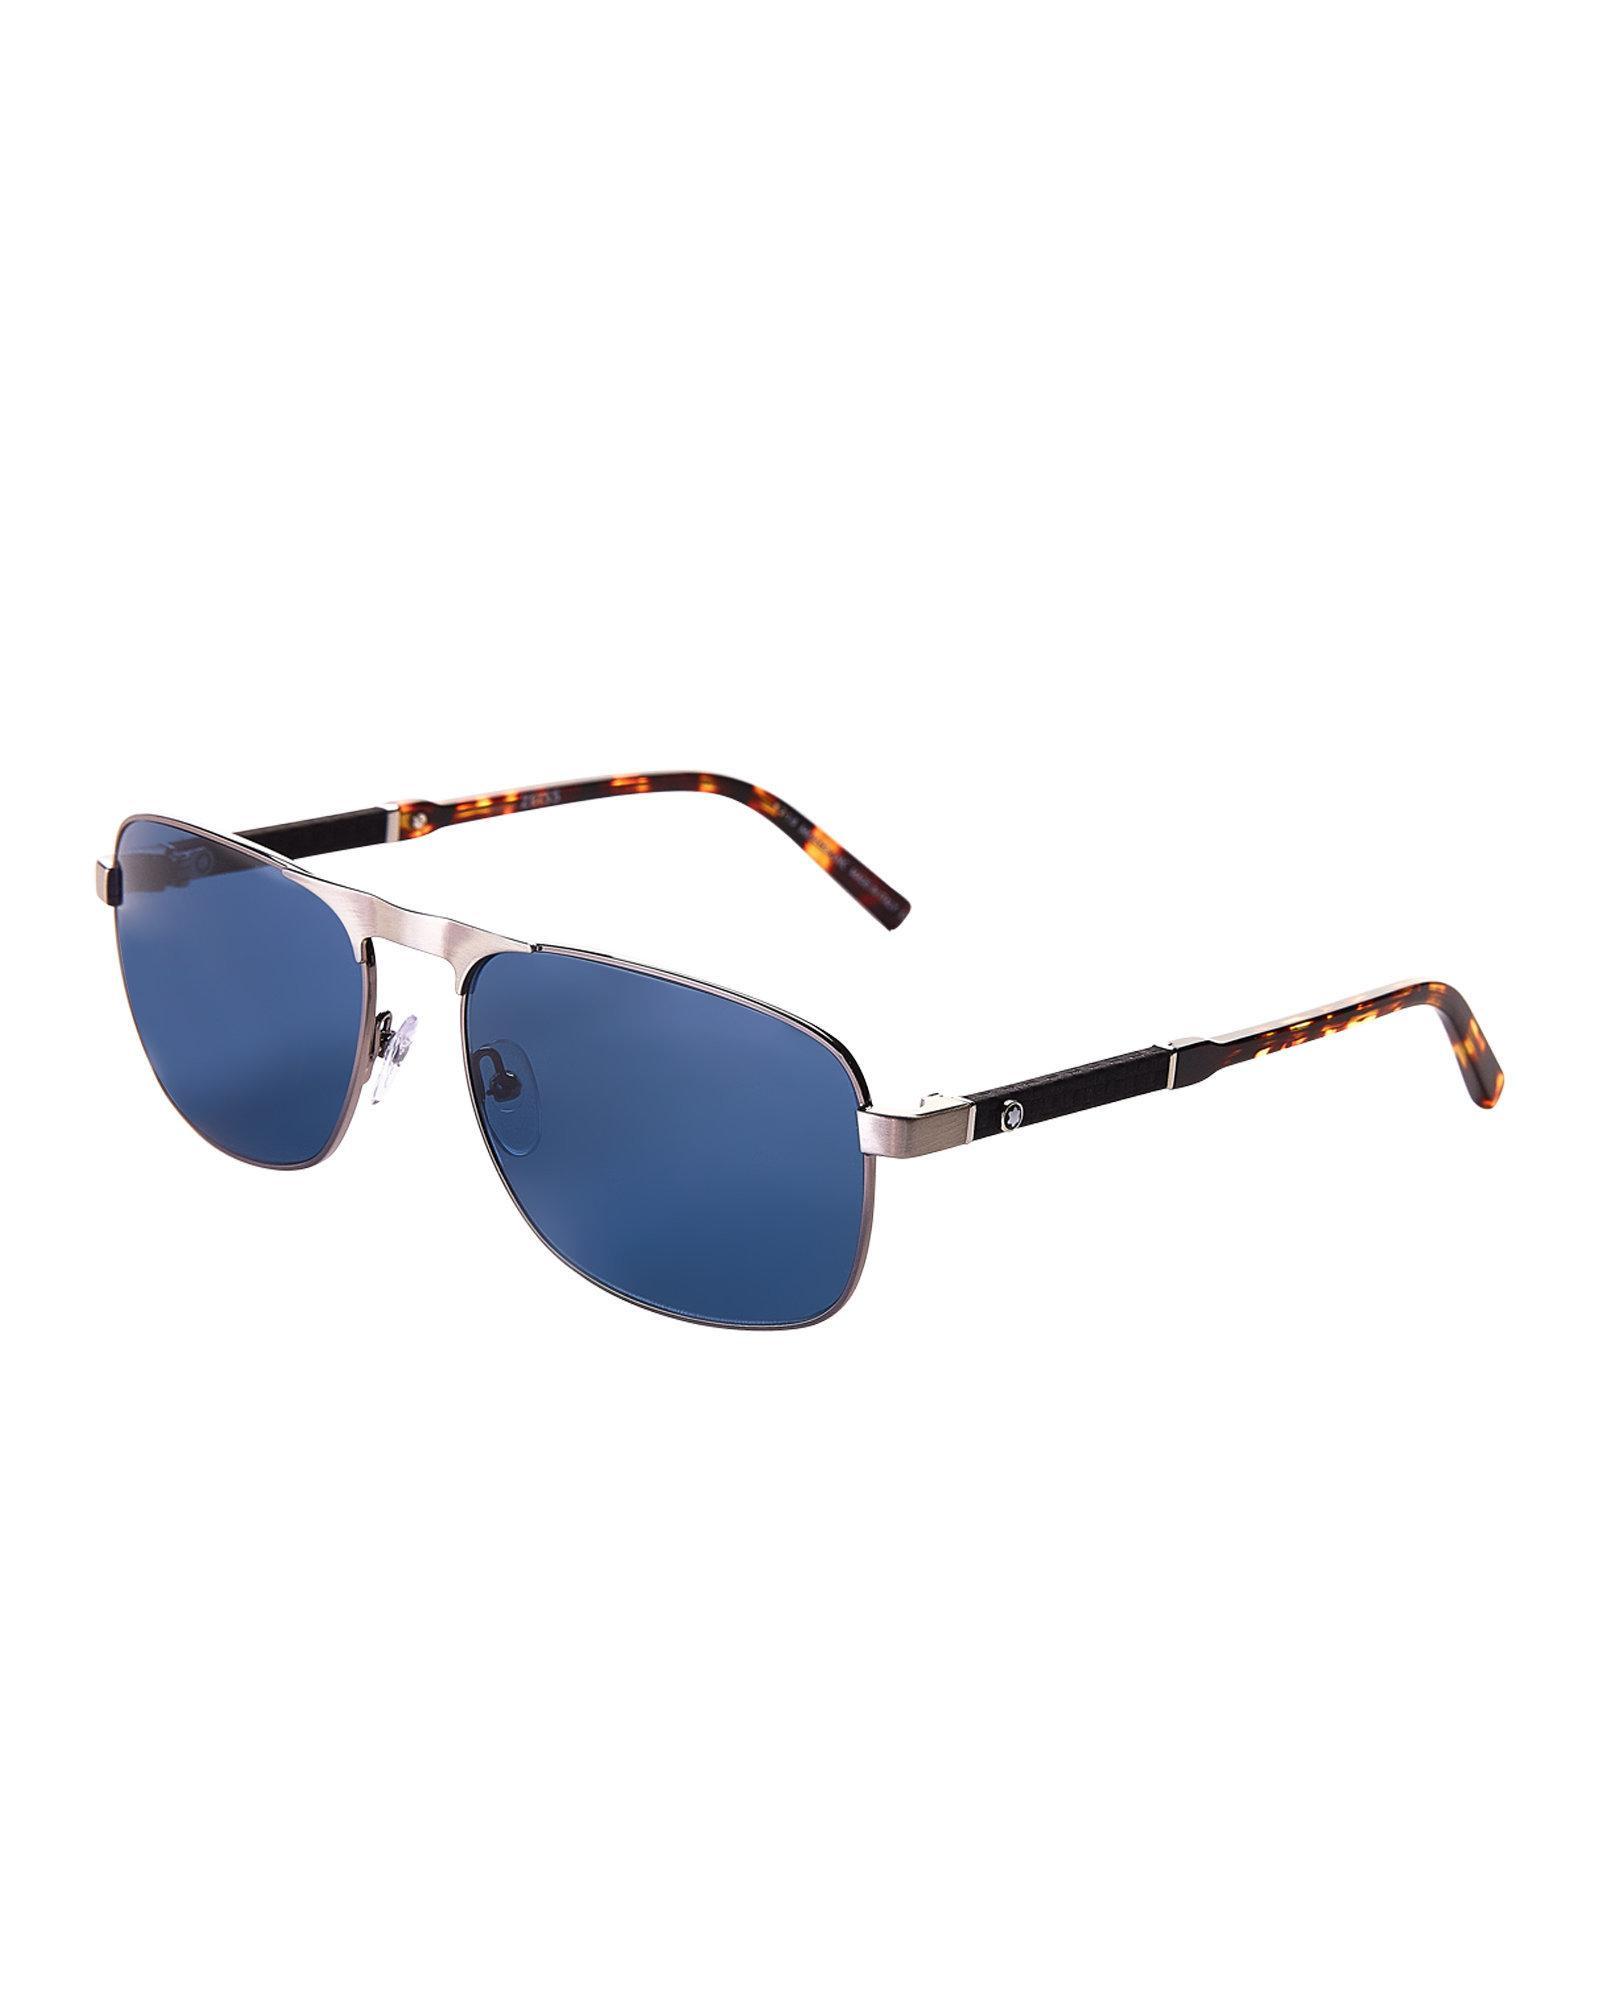 5336b1b4d9 Lyst - Montblanc Mb 655s Tortoiseshell-look Navigator Sunglasses in Blue